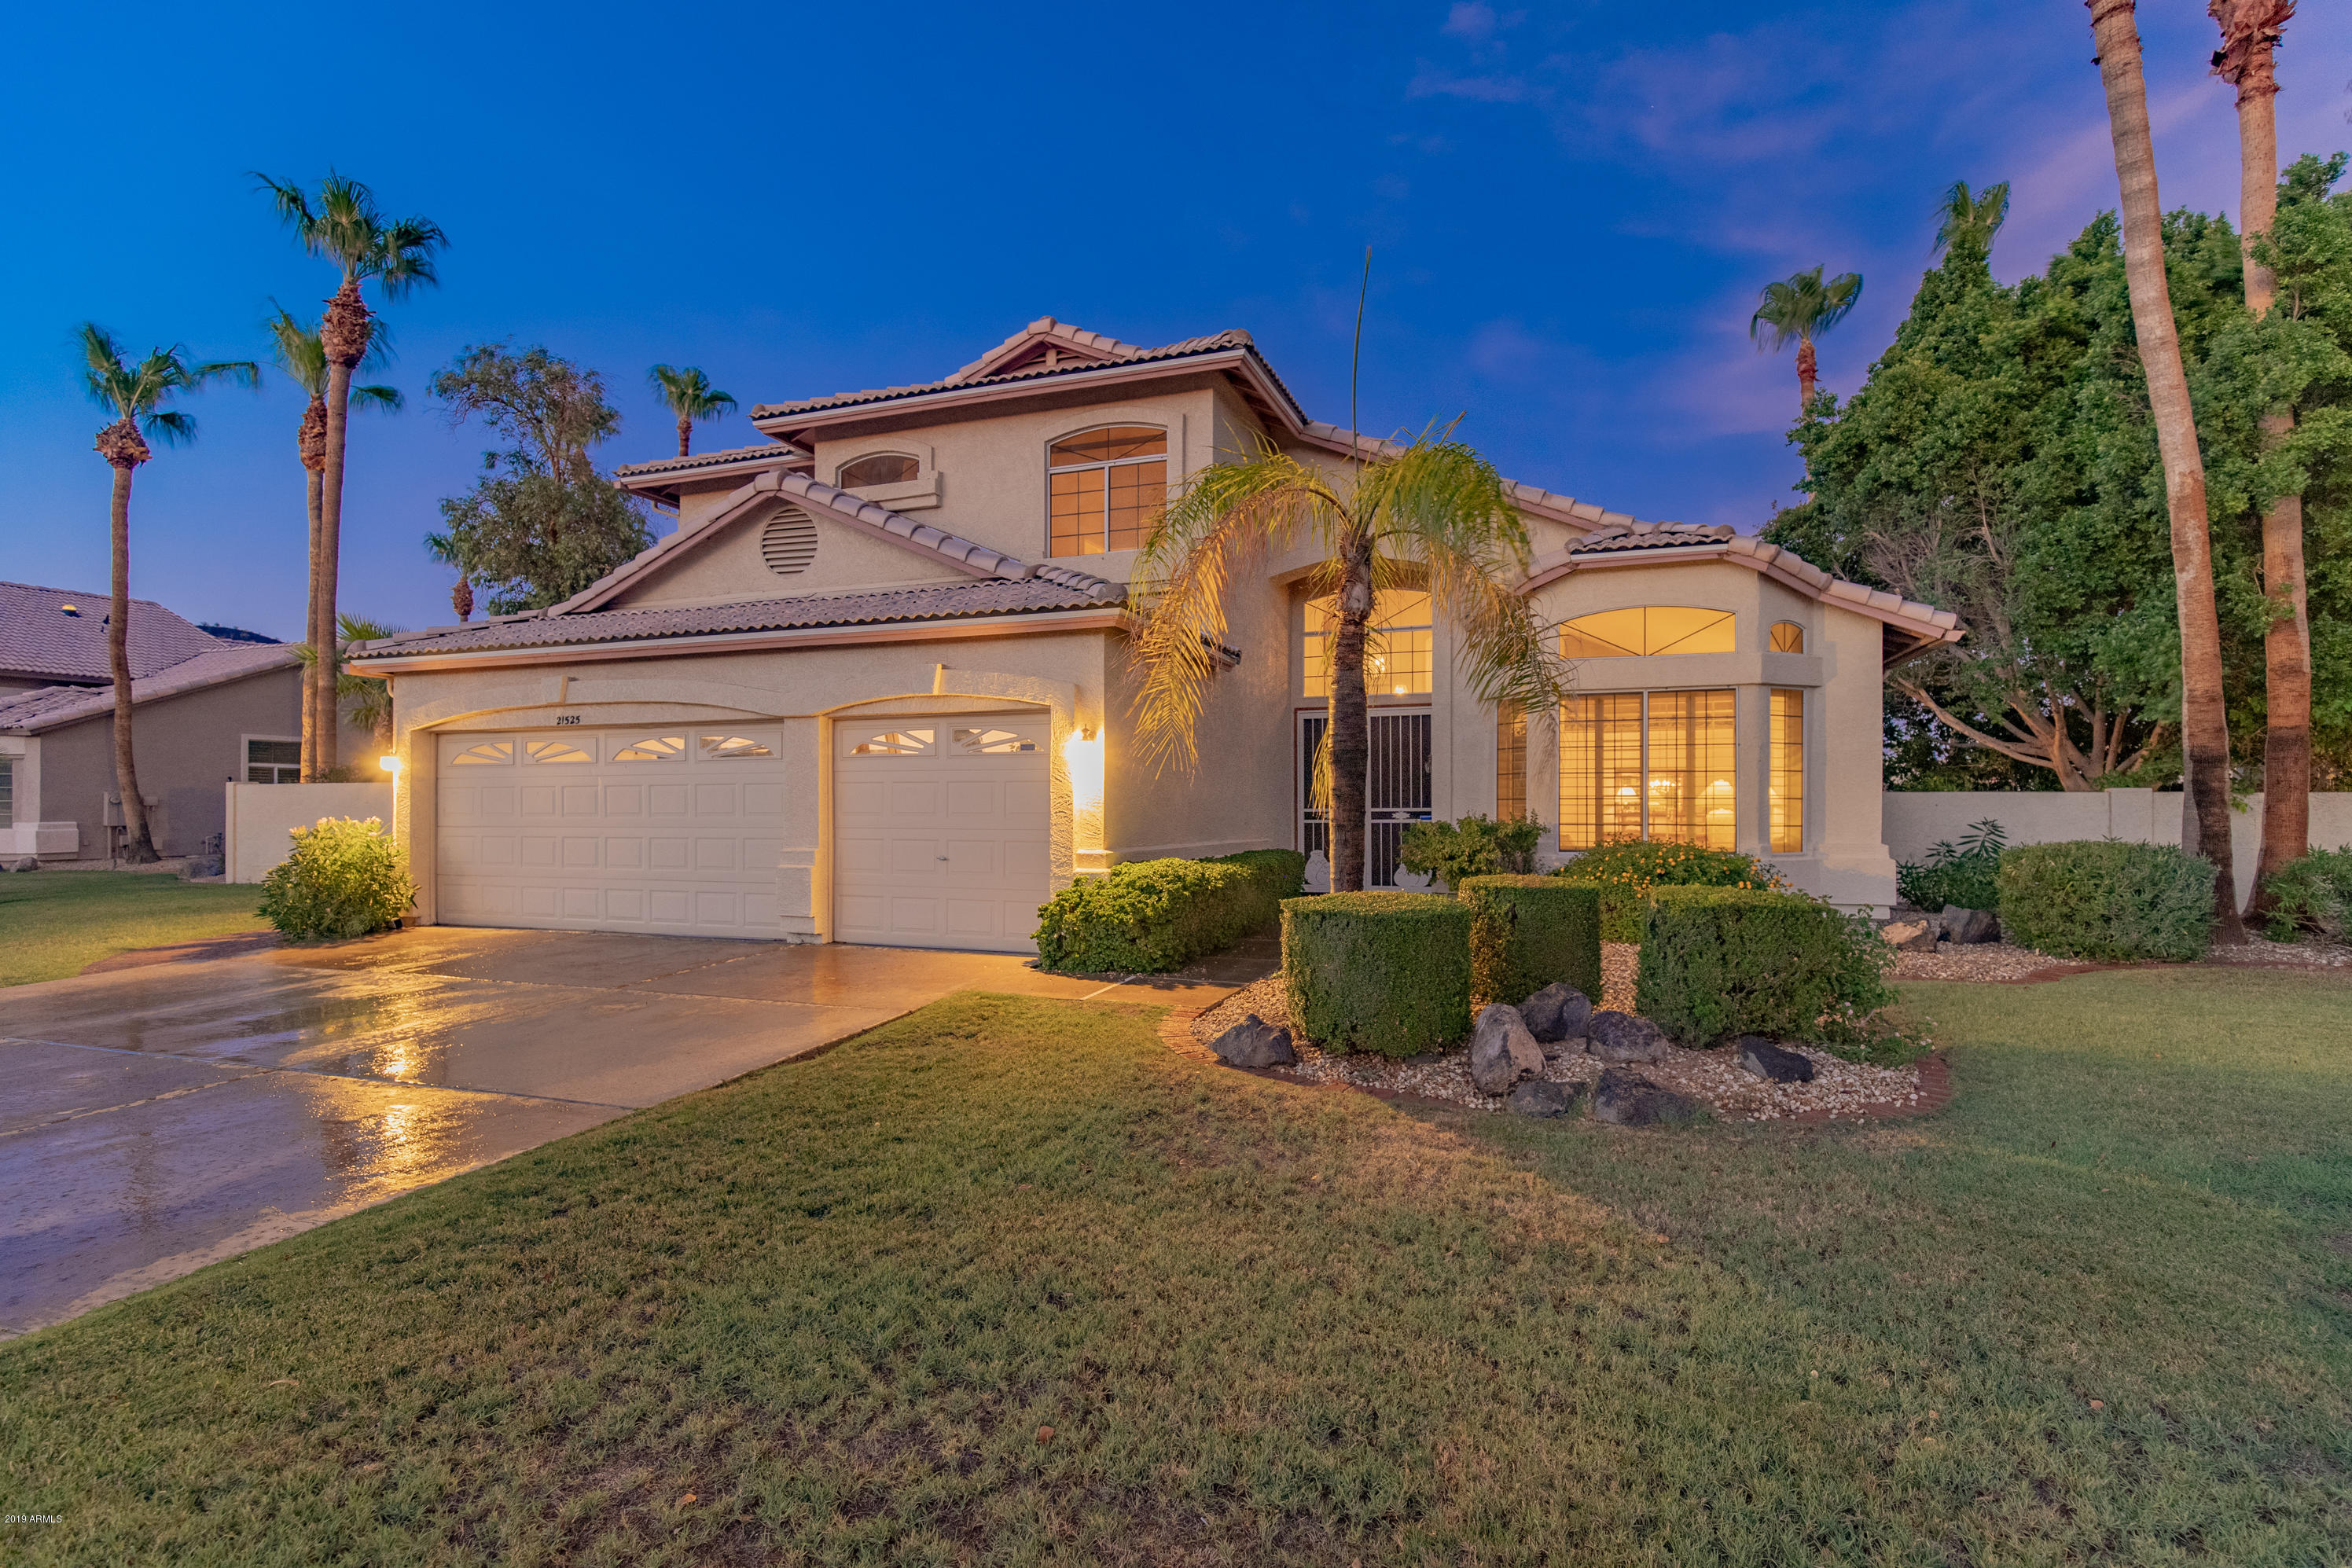 Photo of 21525 N 58TH Drive, Glendale, AZ 85308